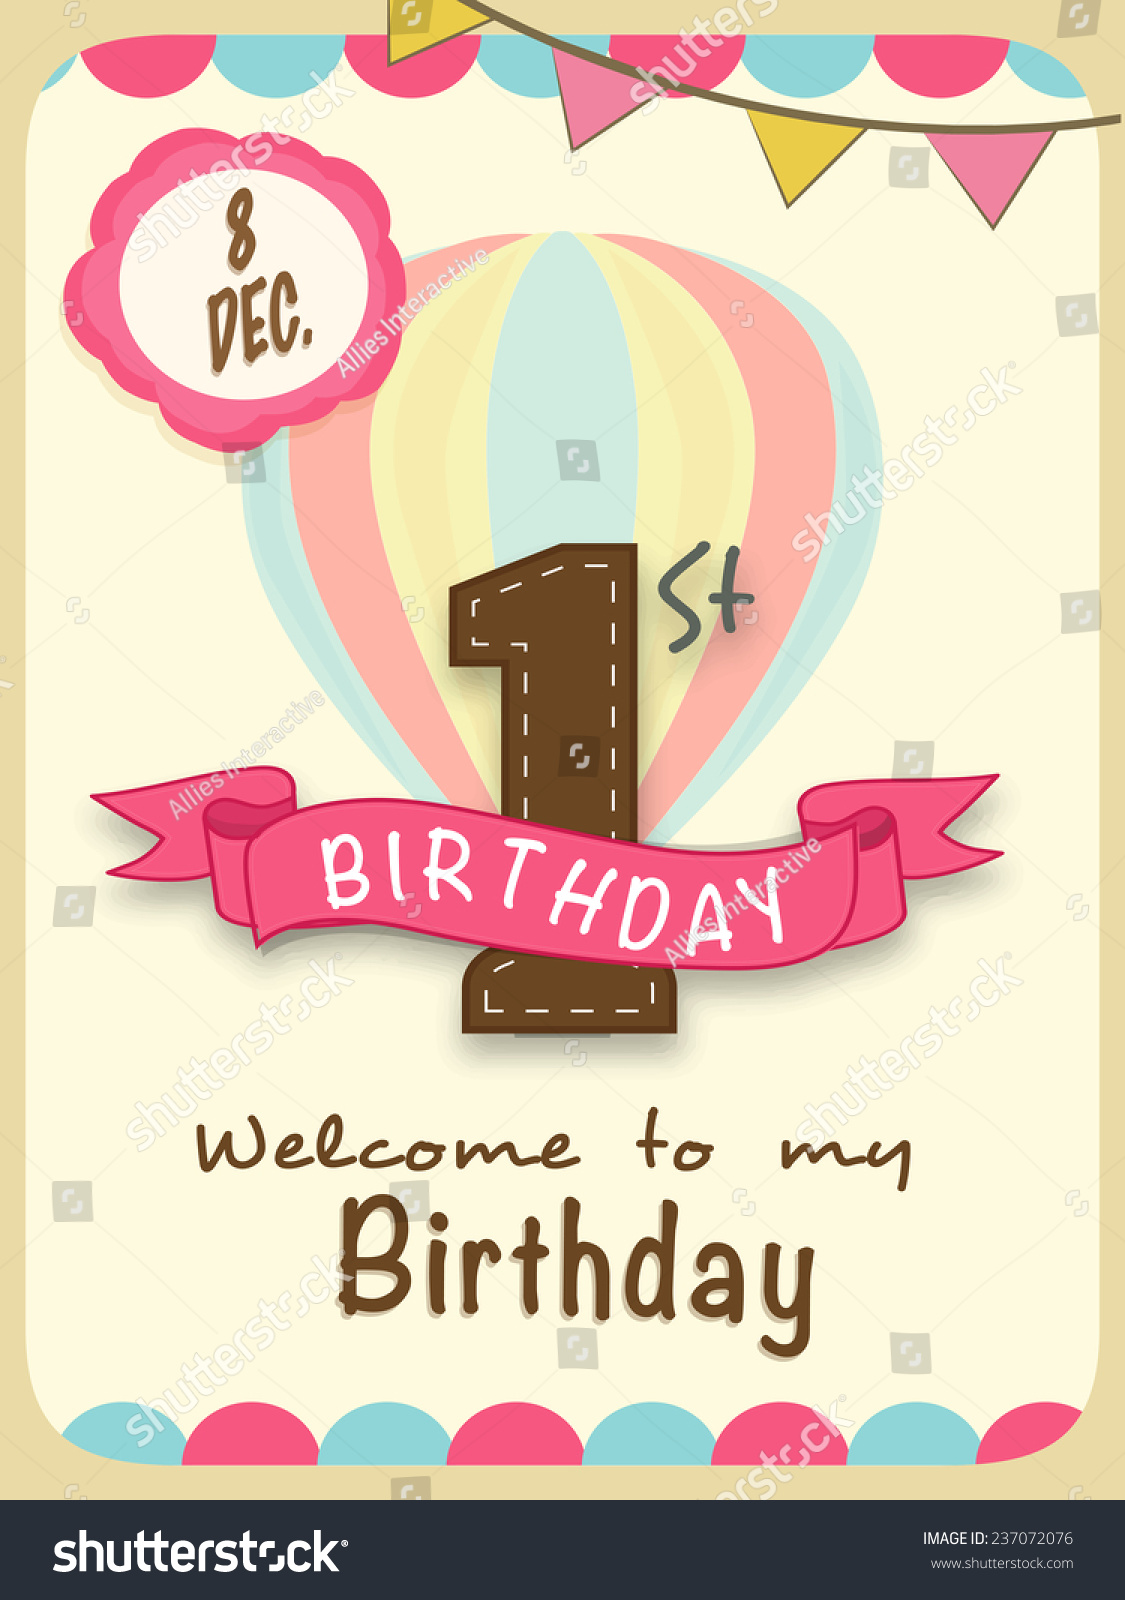 1st Birthday Invitation Card Design Amazing Designing Birthday – Invitation Card Design Birthday Party